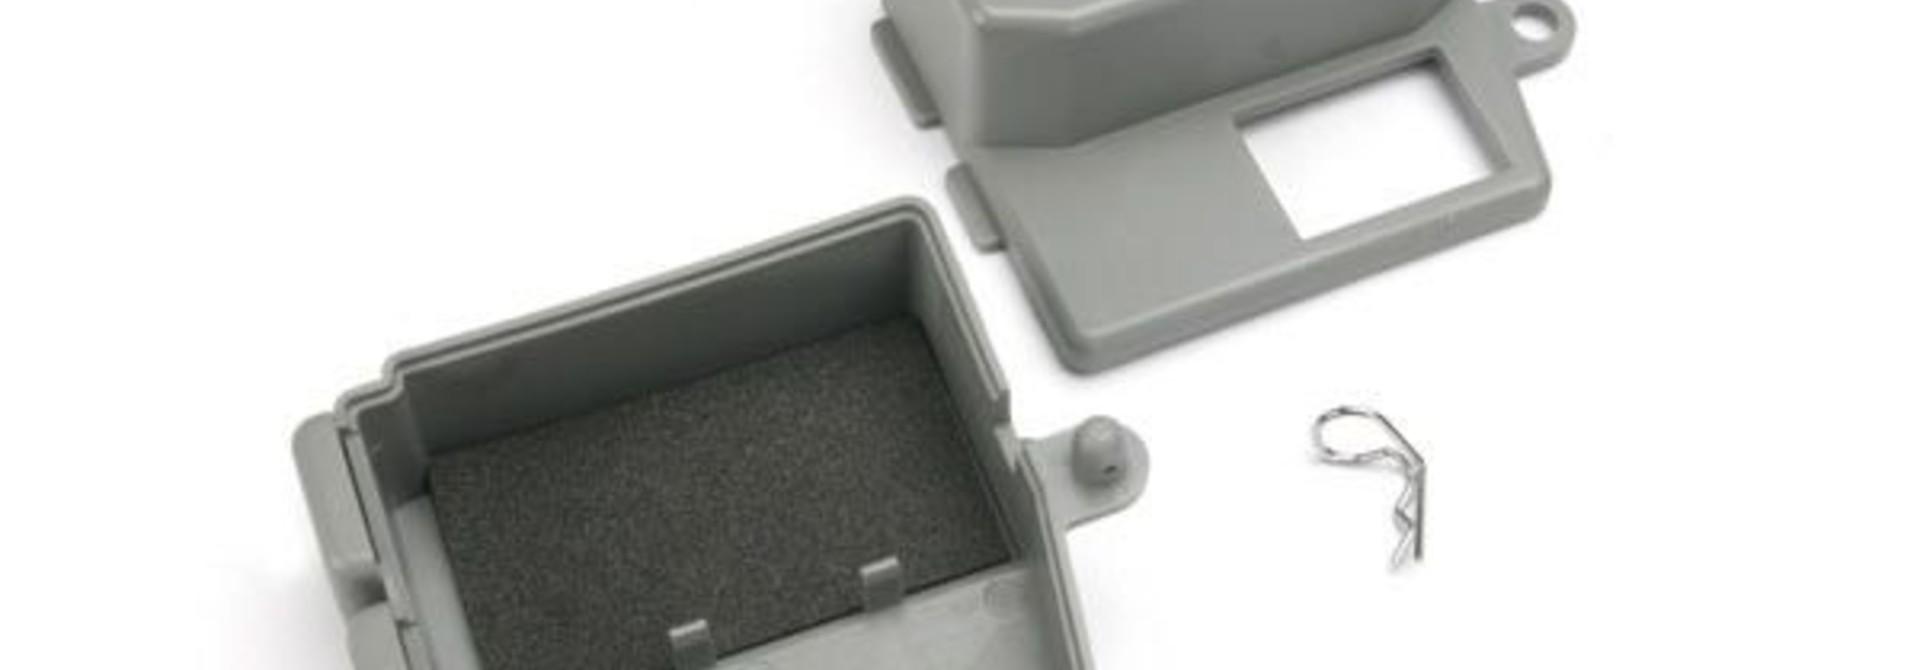 Box, receiver (upper and lower halves)/ clip (1)/ foam pad, TRX5159